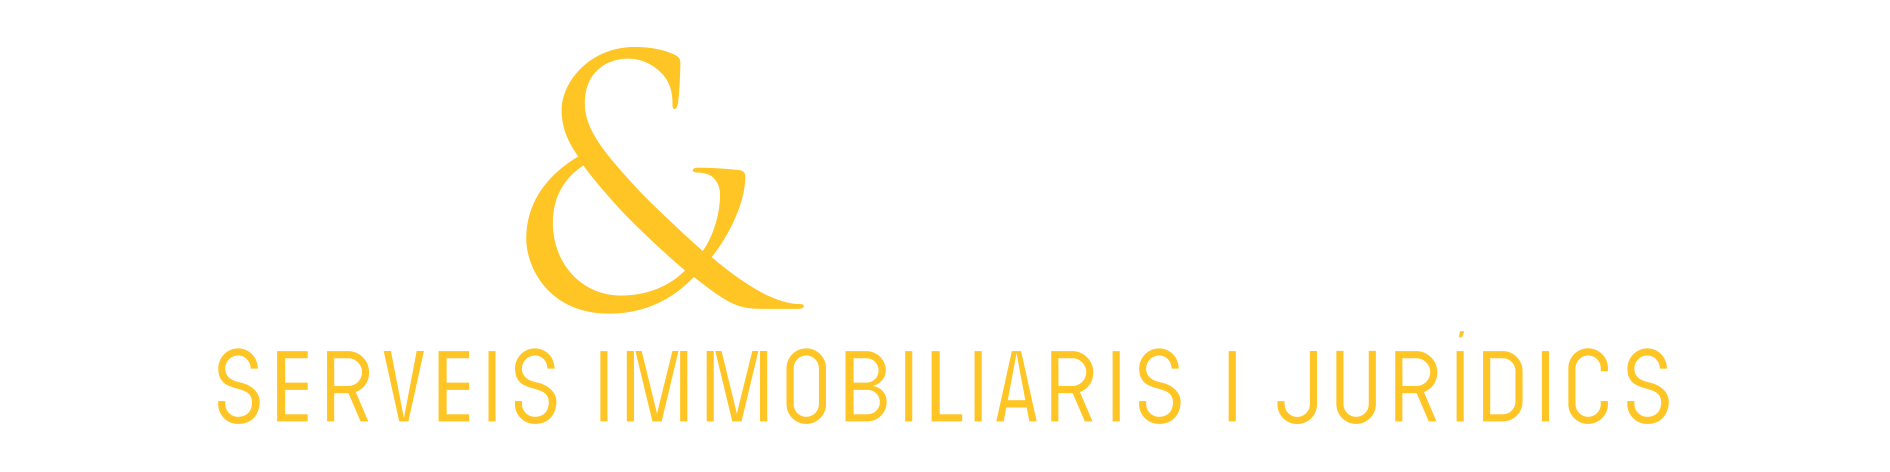 Feliu Franquesa logo footer